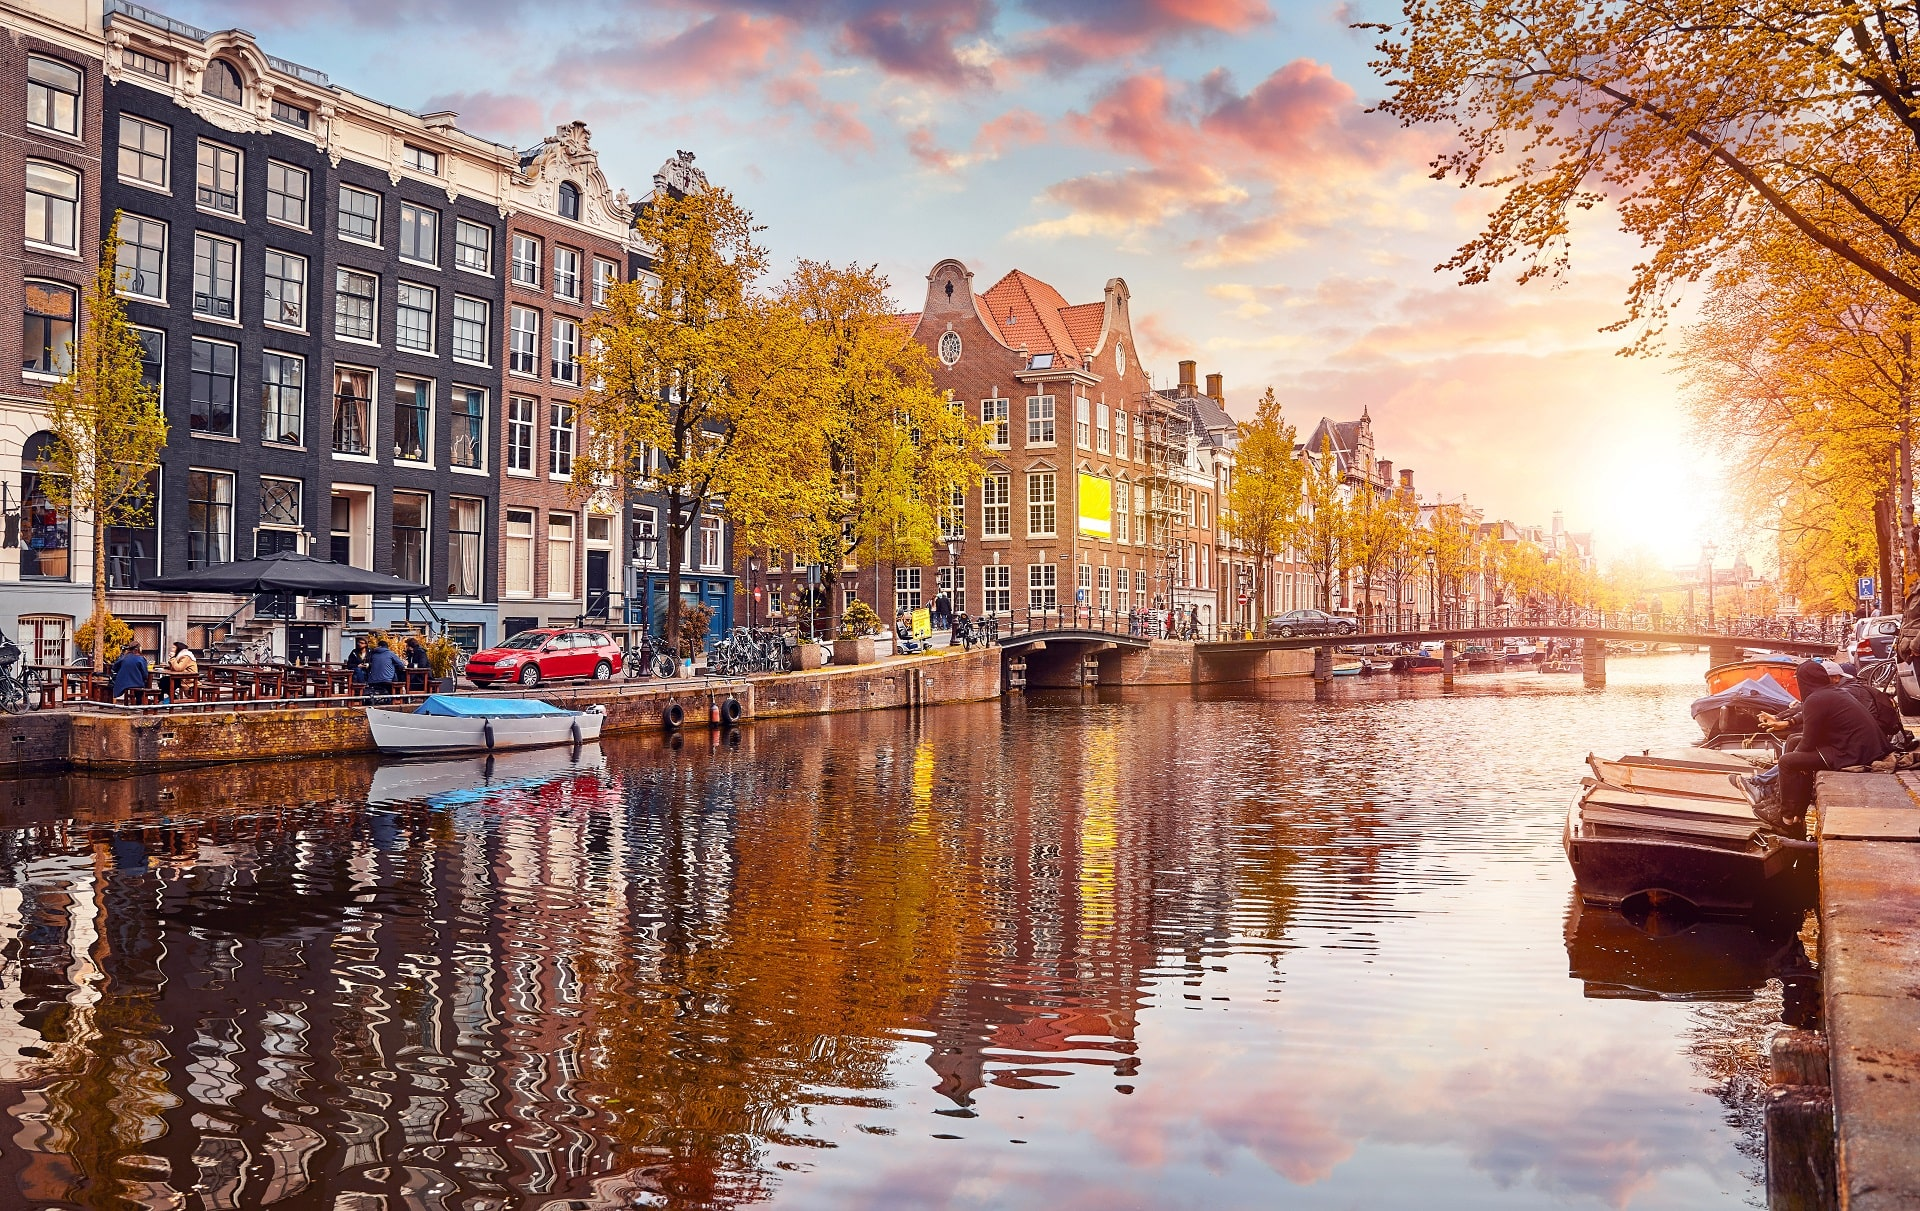 Amsterdam-05685